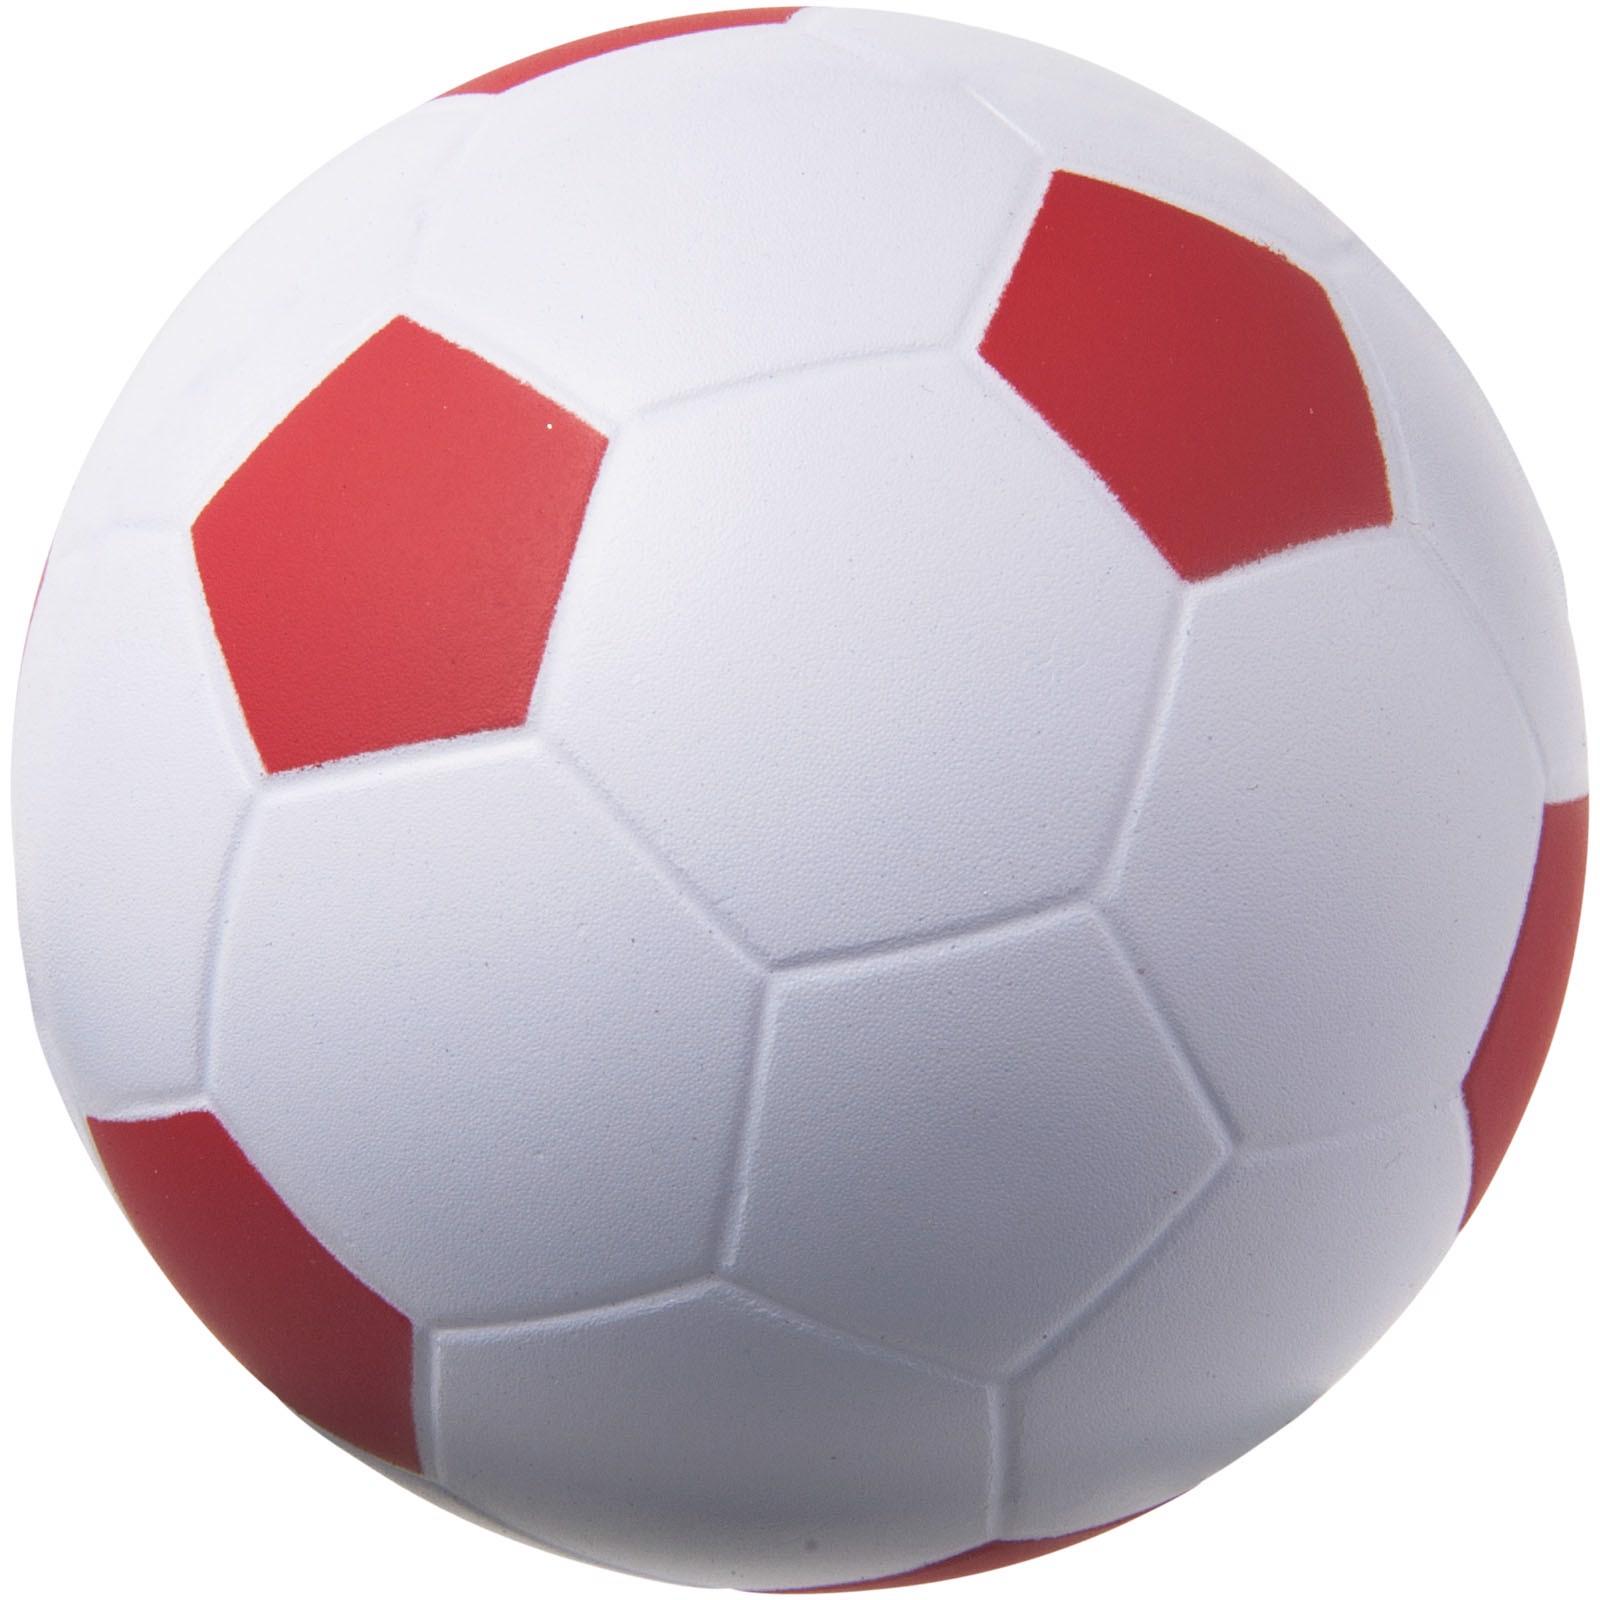 Antistresový míč Football - Červená s efektem námrazy / Bílá